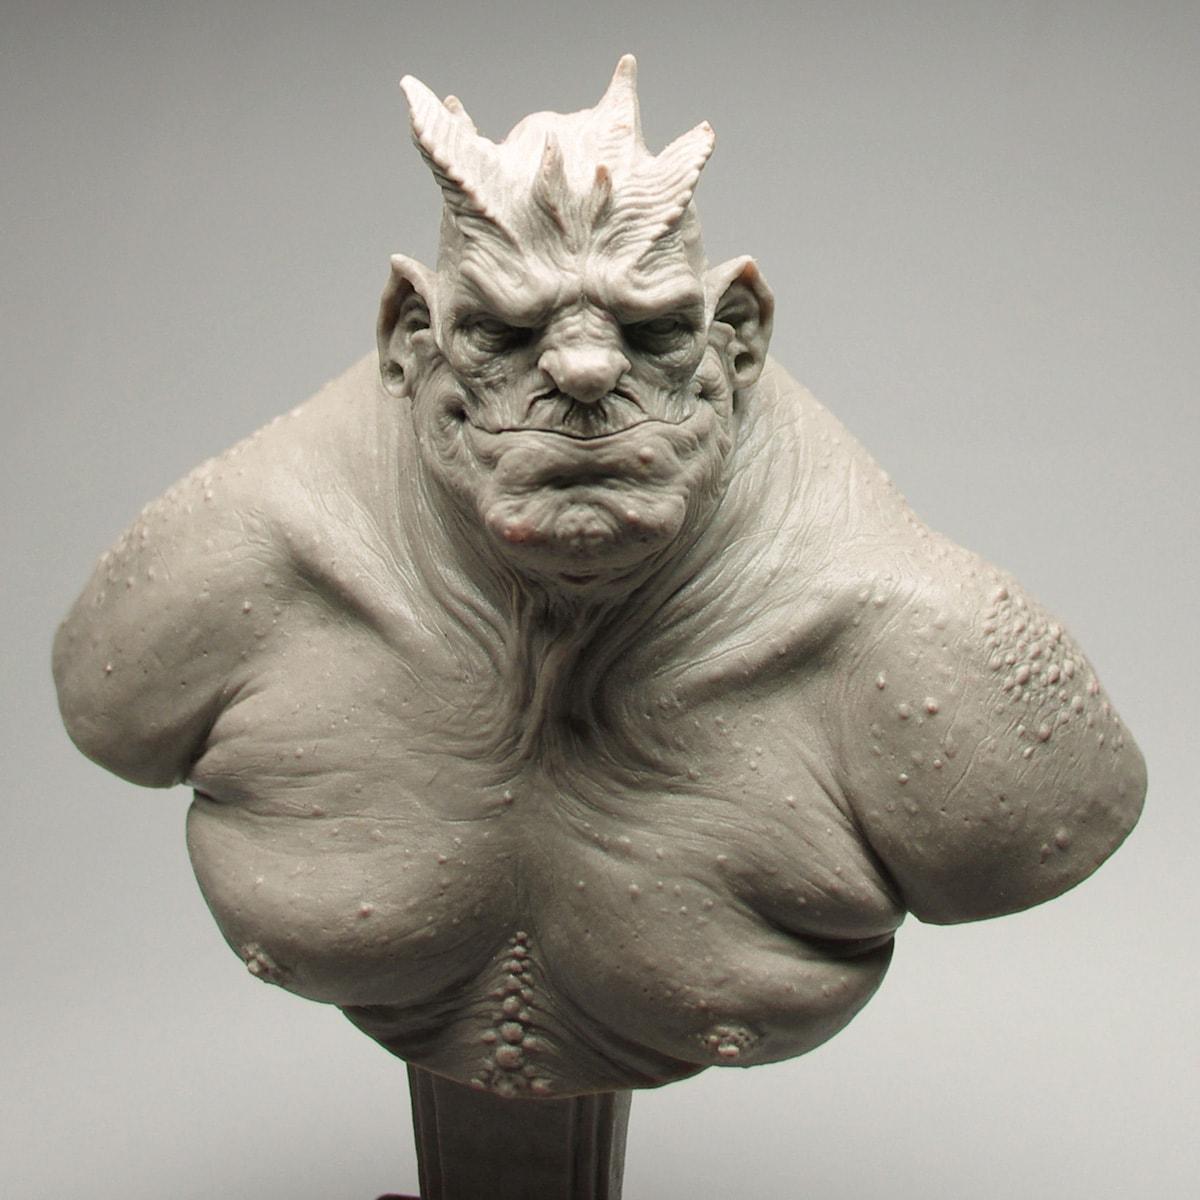 Demon-obese4